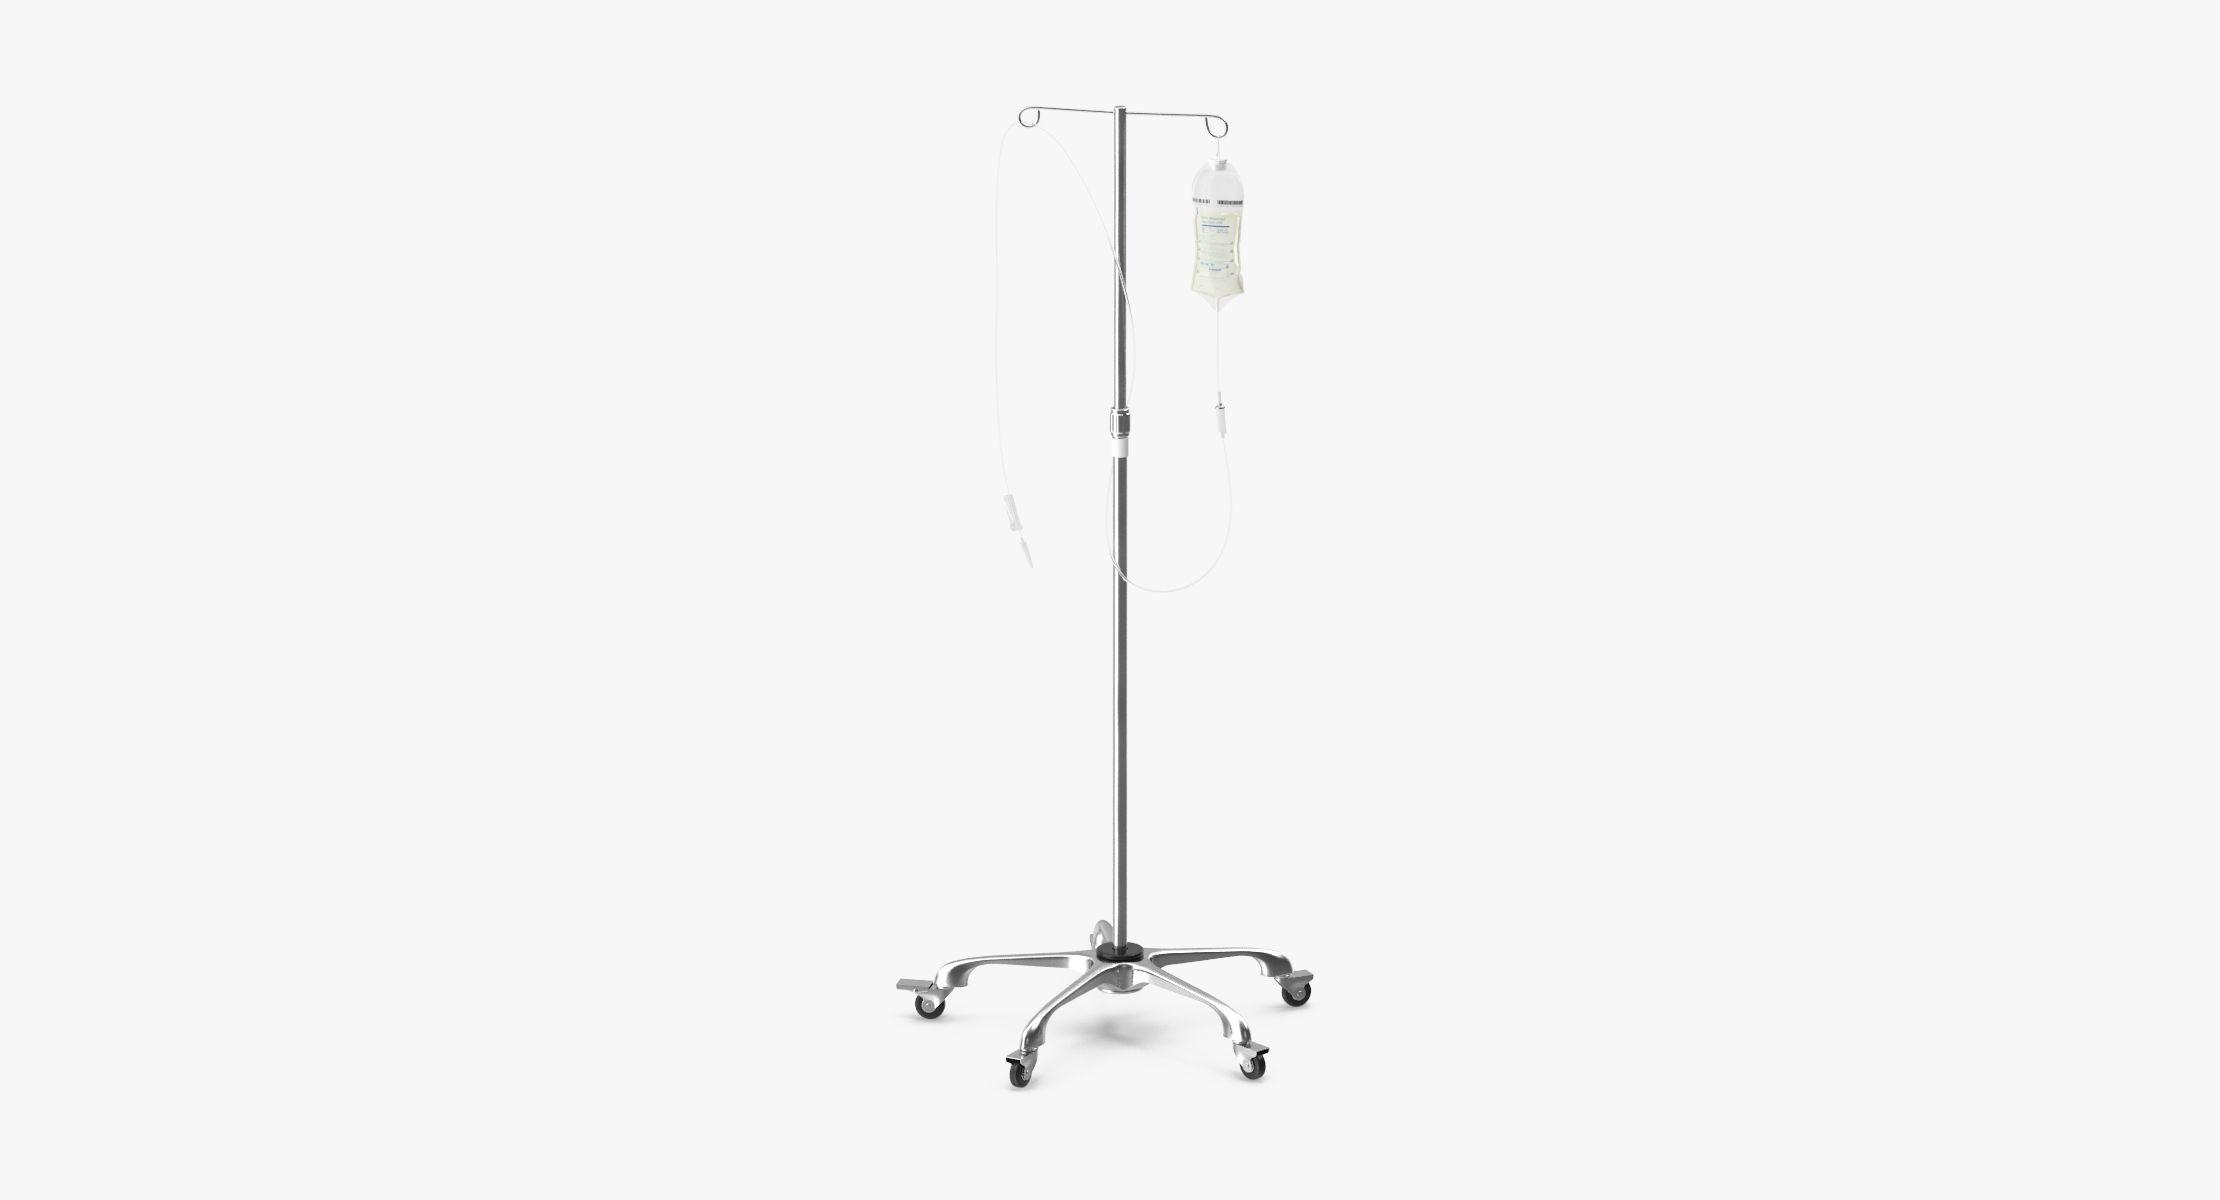 Hospital IV Stand - reel 1